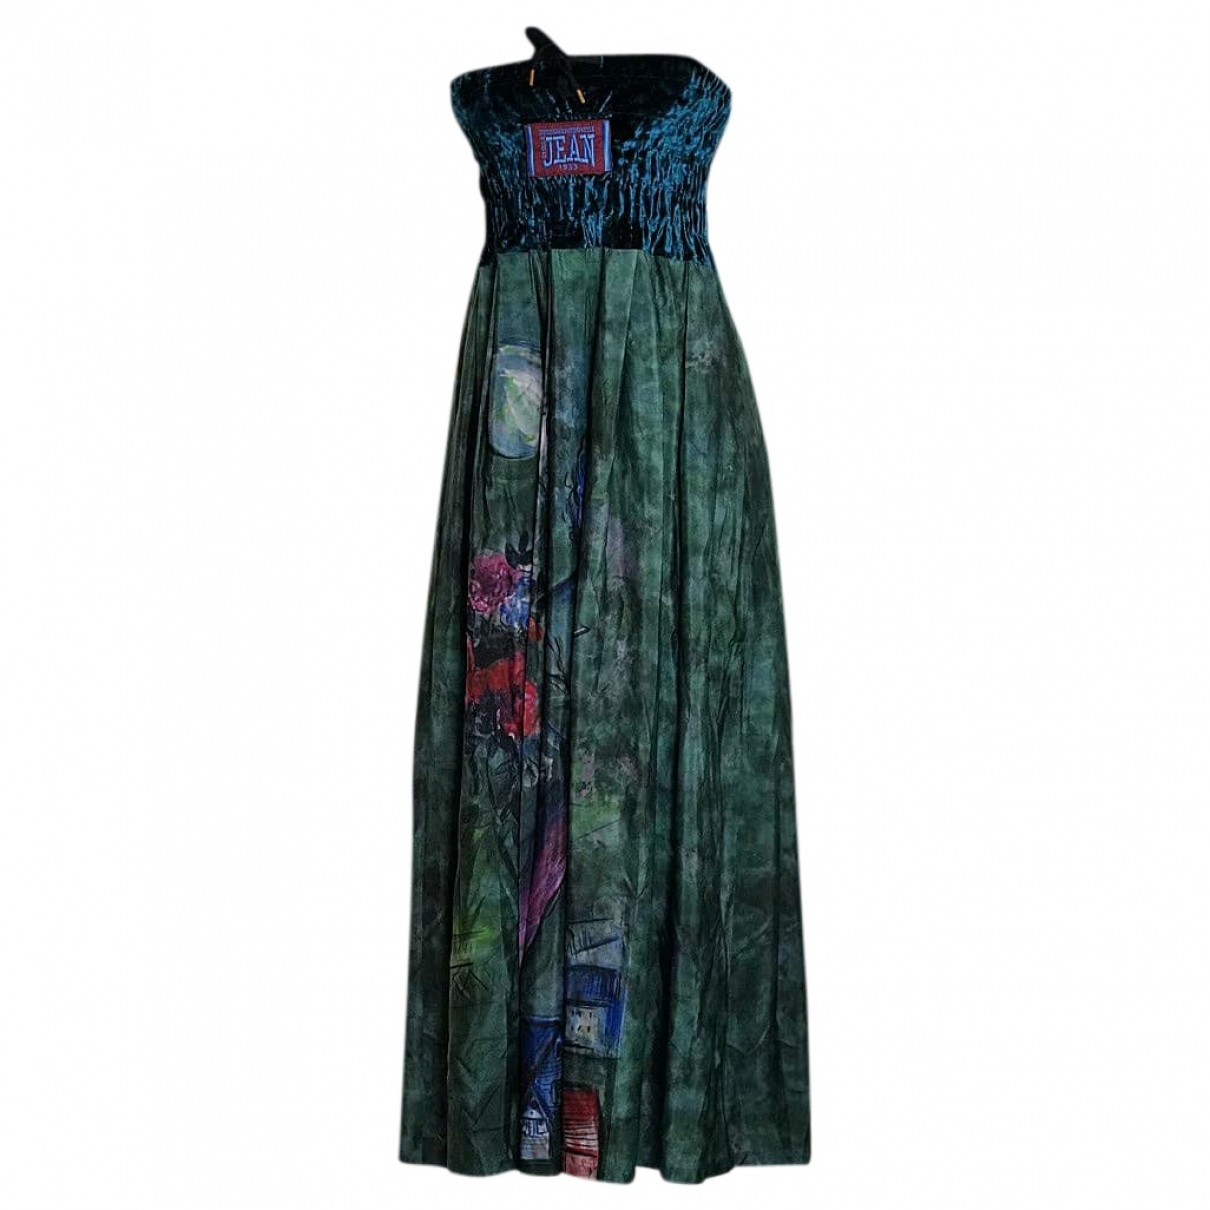 Stella Jean \N Kleid in  Gruen Polyester